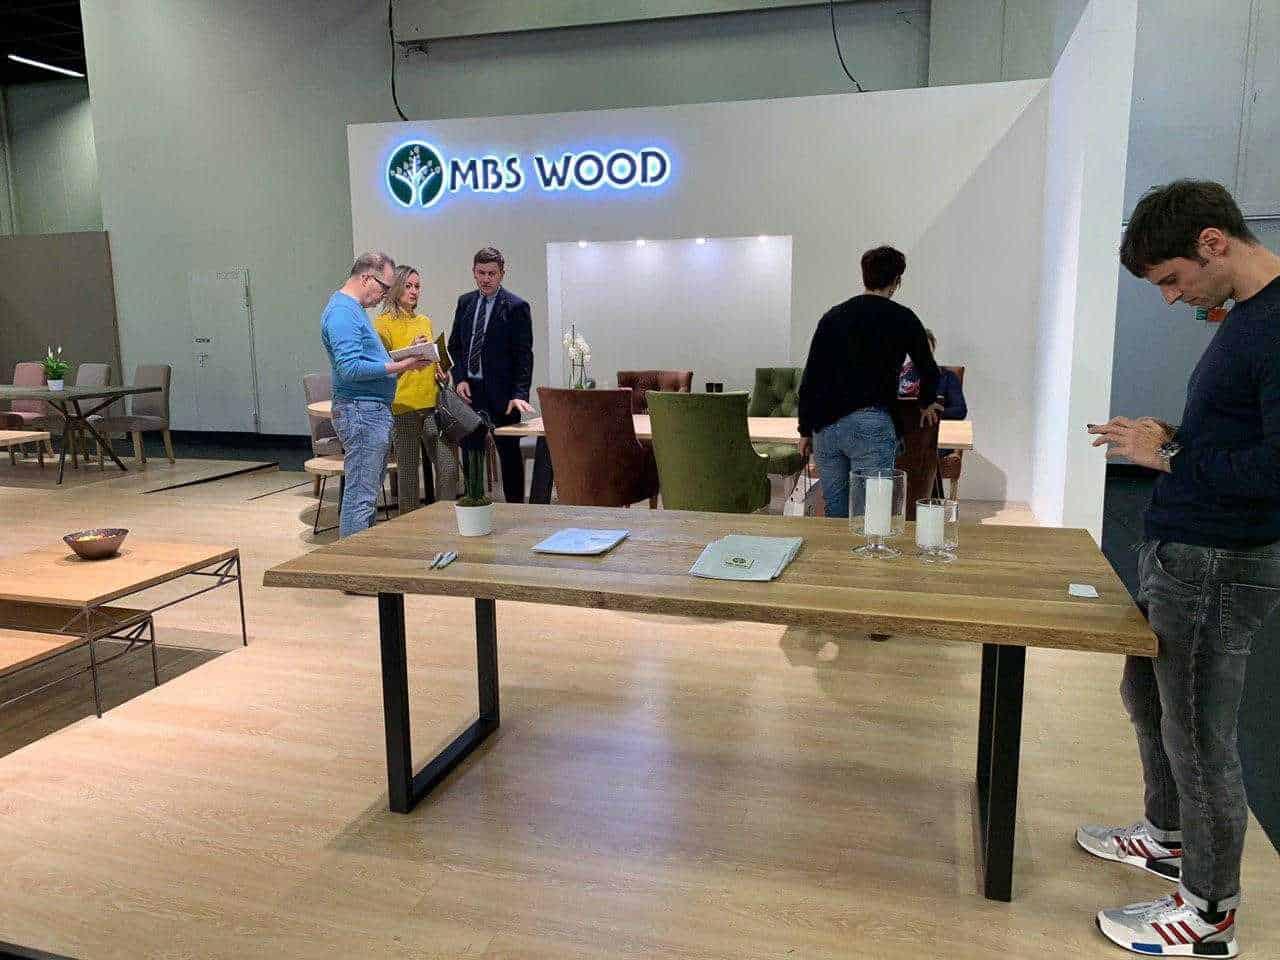 Exposición de muebles mesas de madera